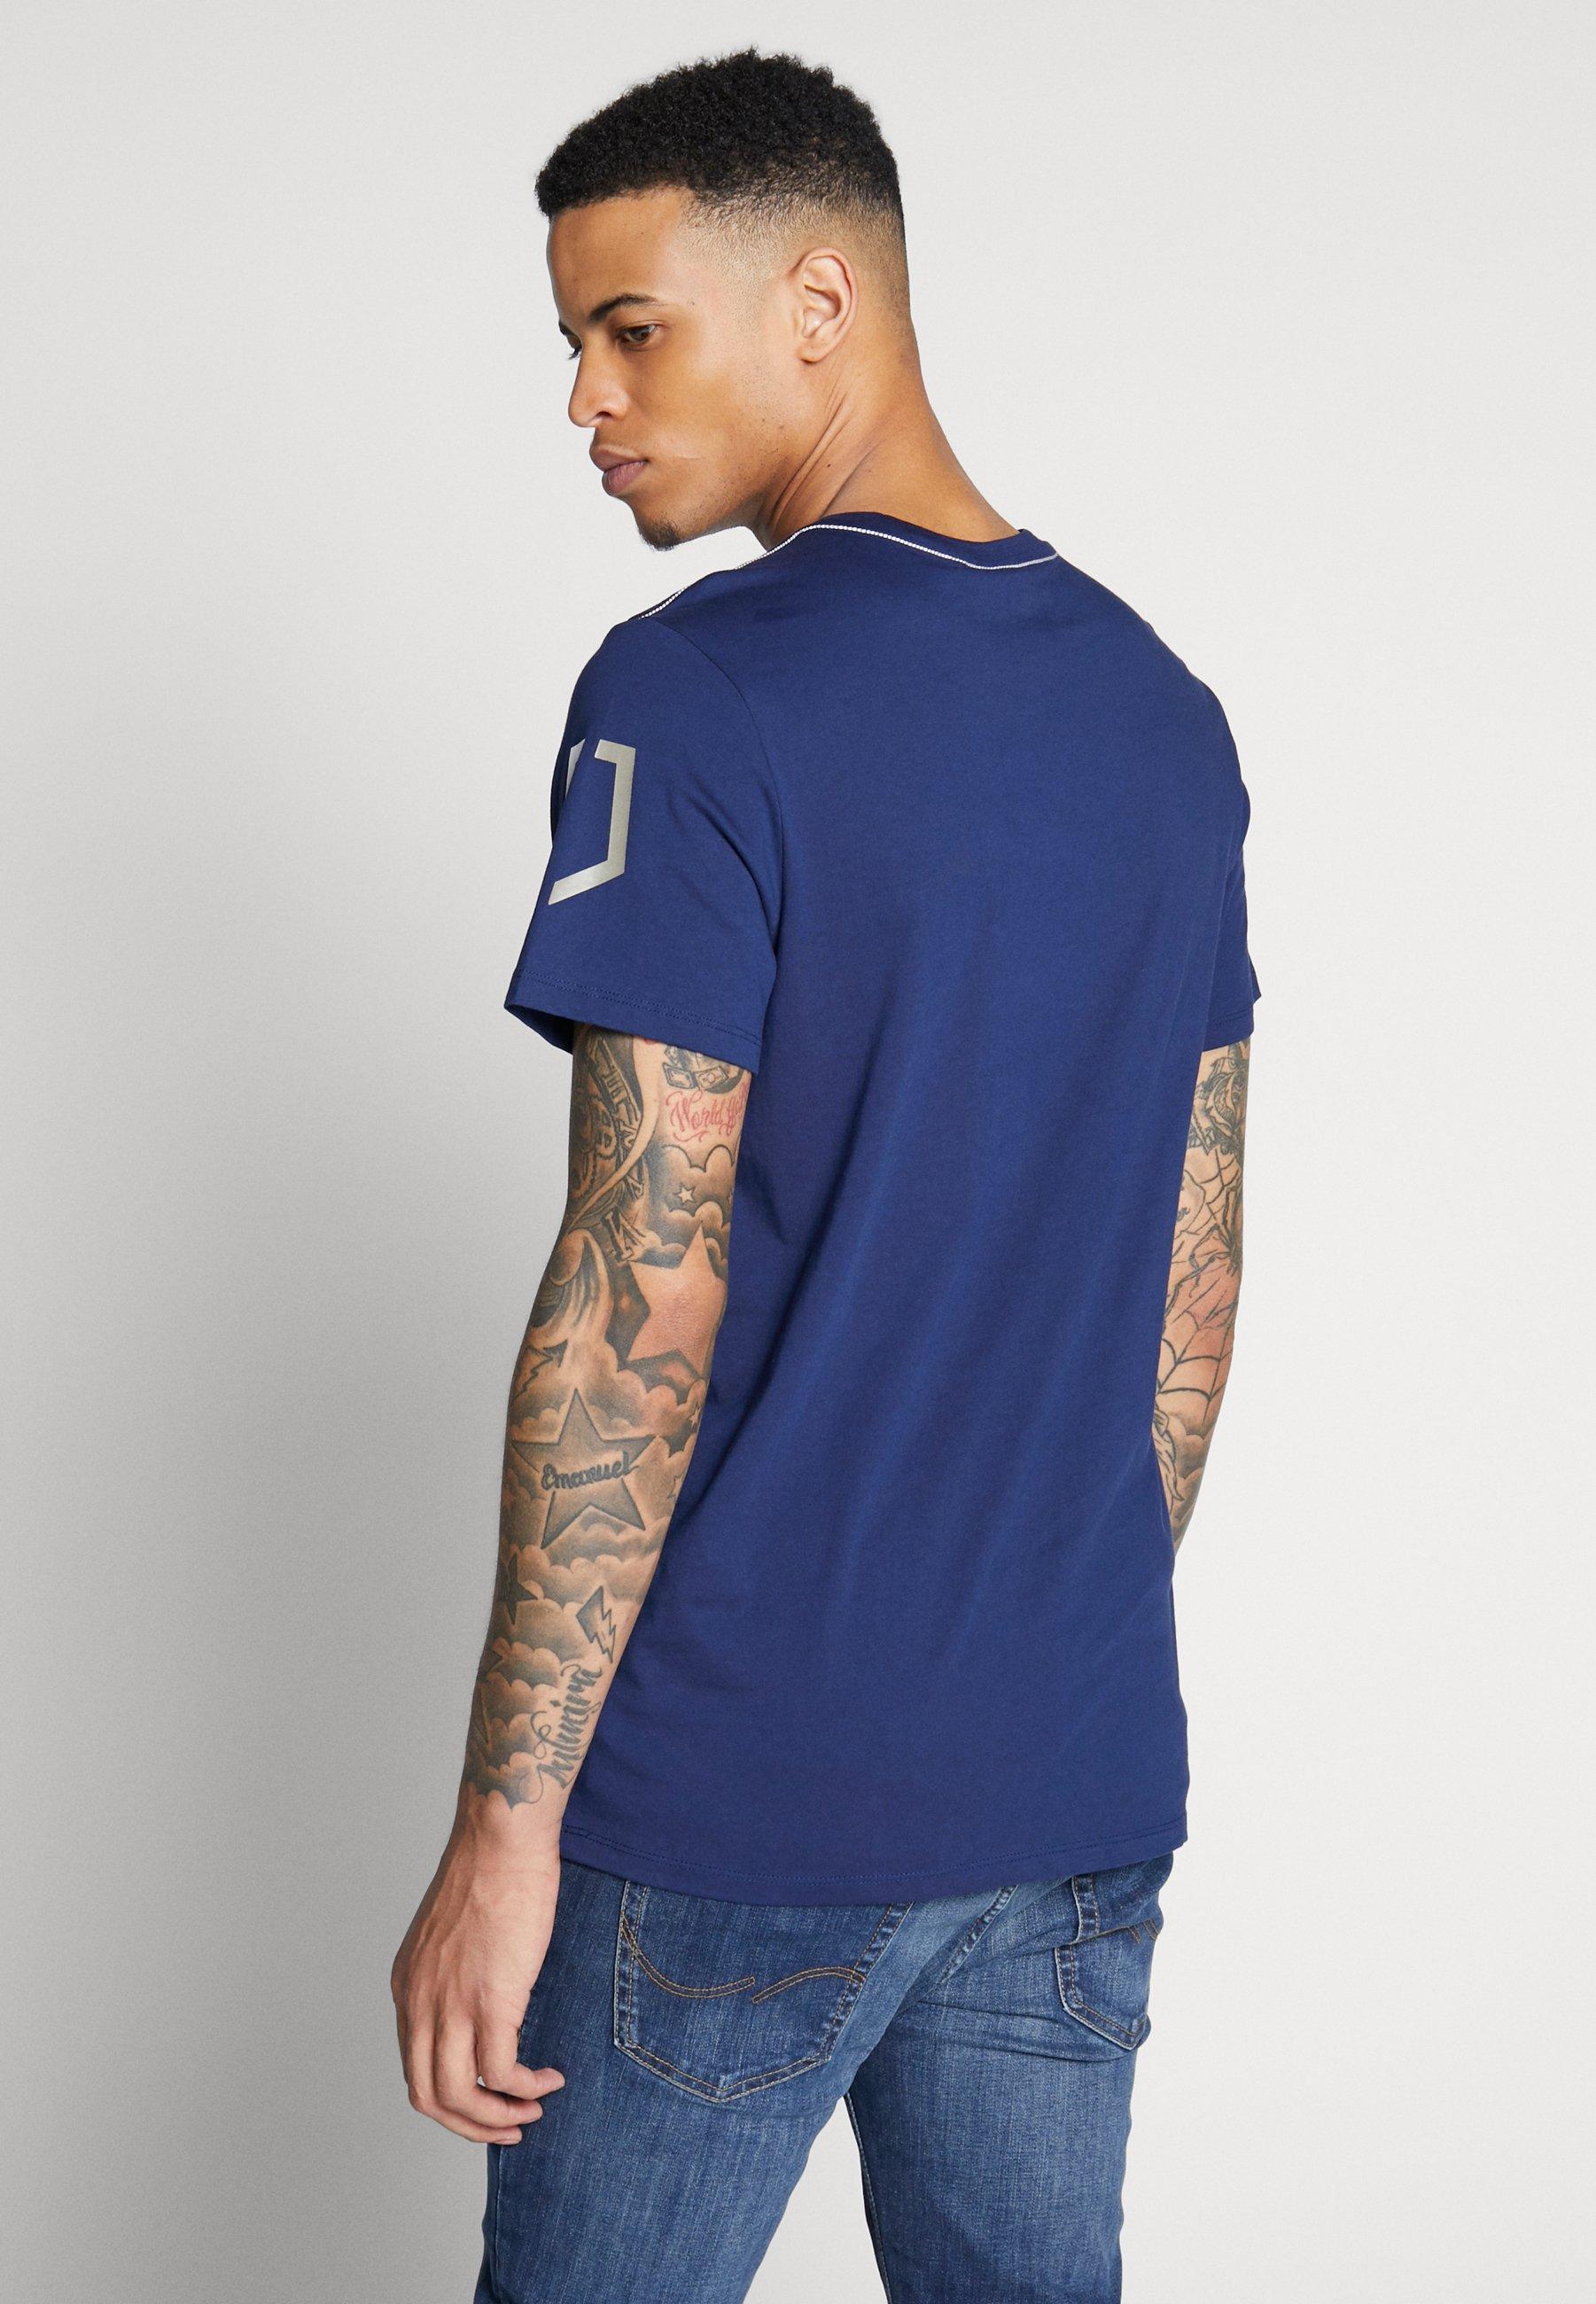 G-star Sleeve Shield - T-shirt Imprimé Imperial Blue